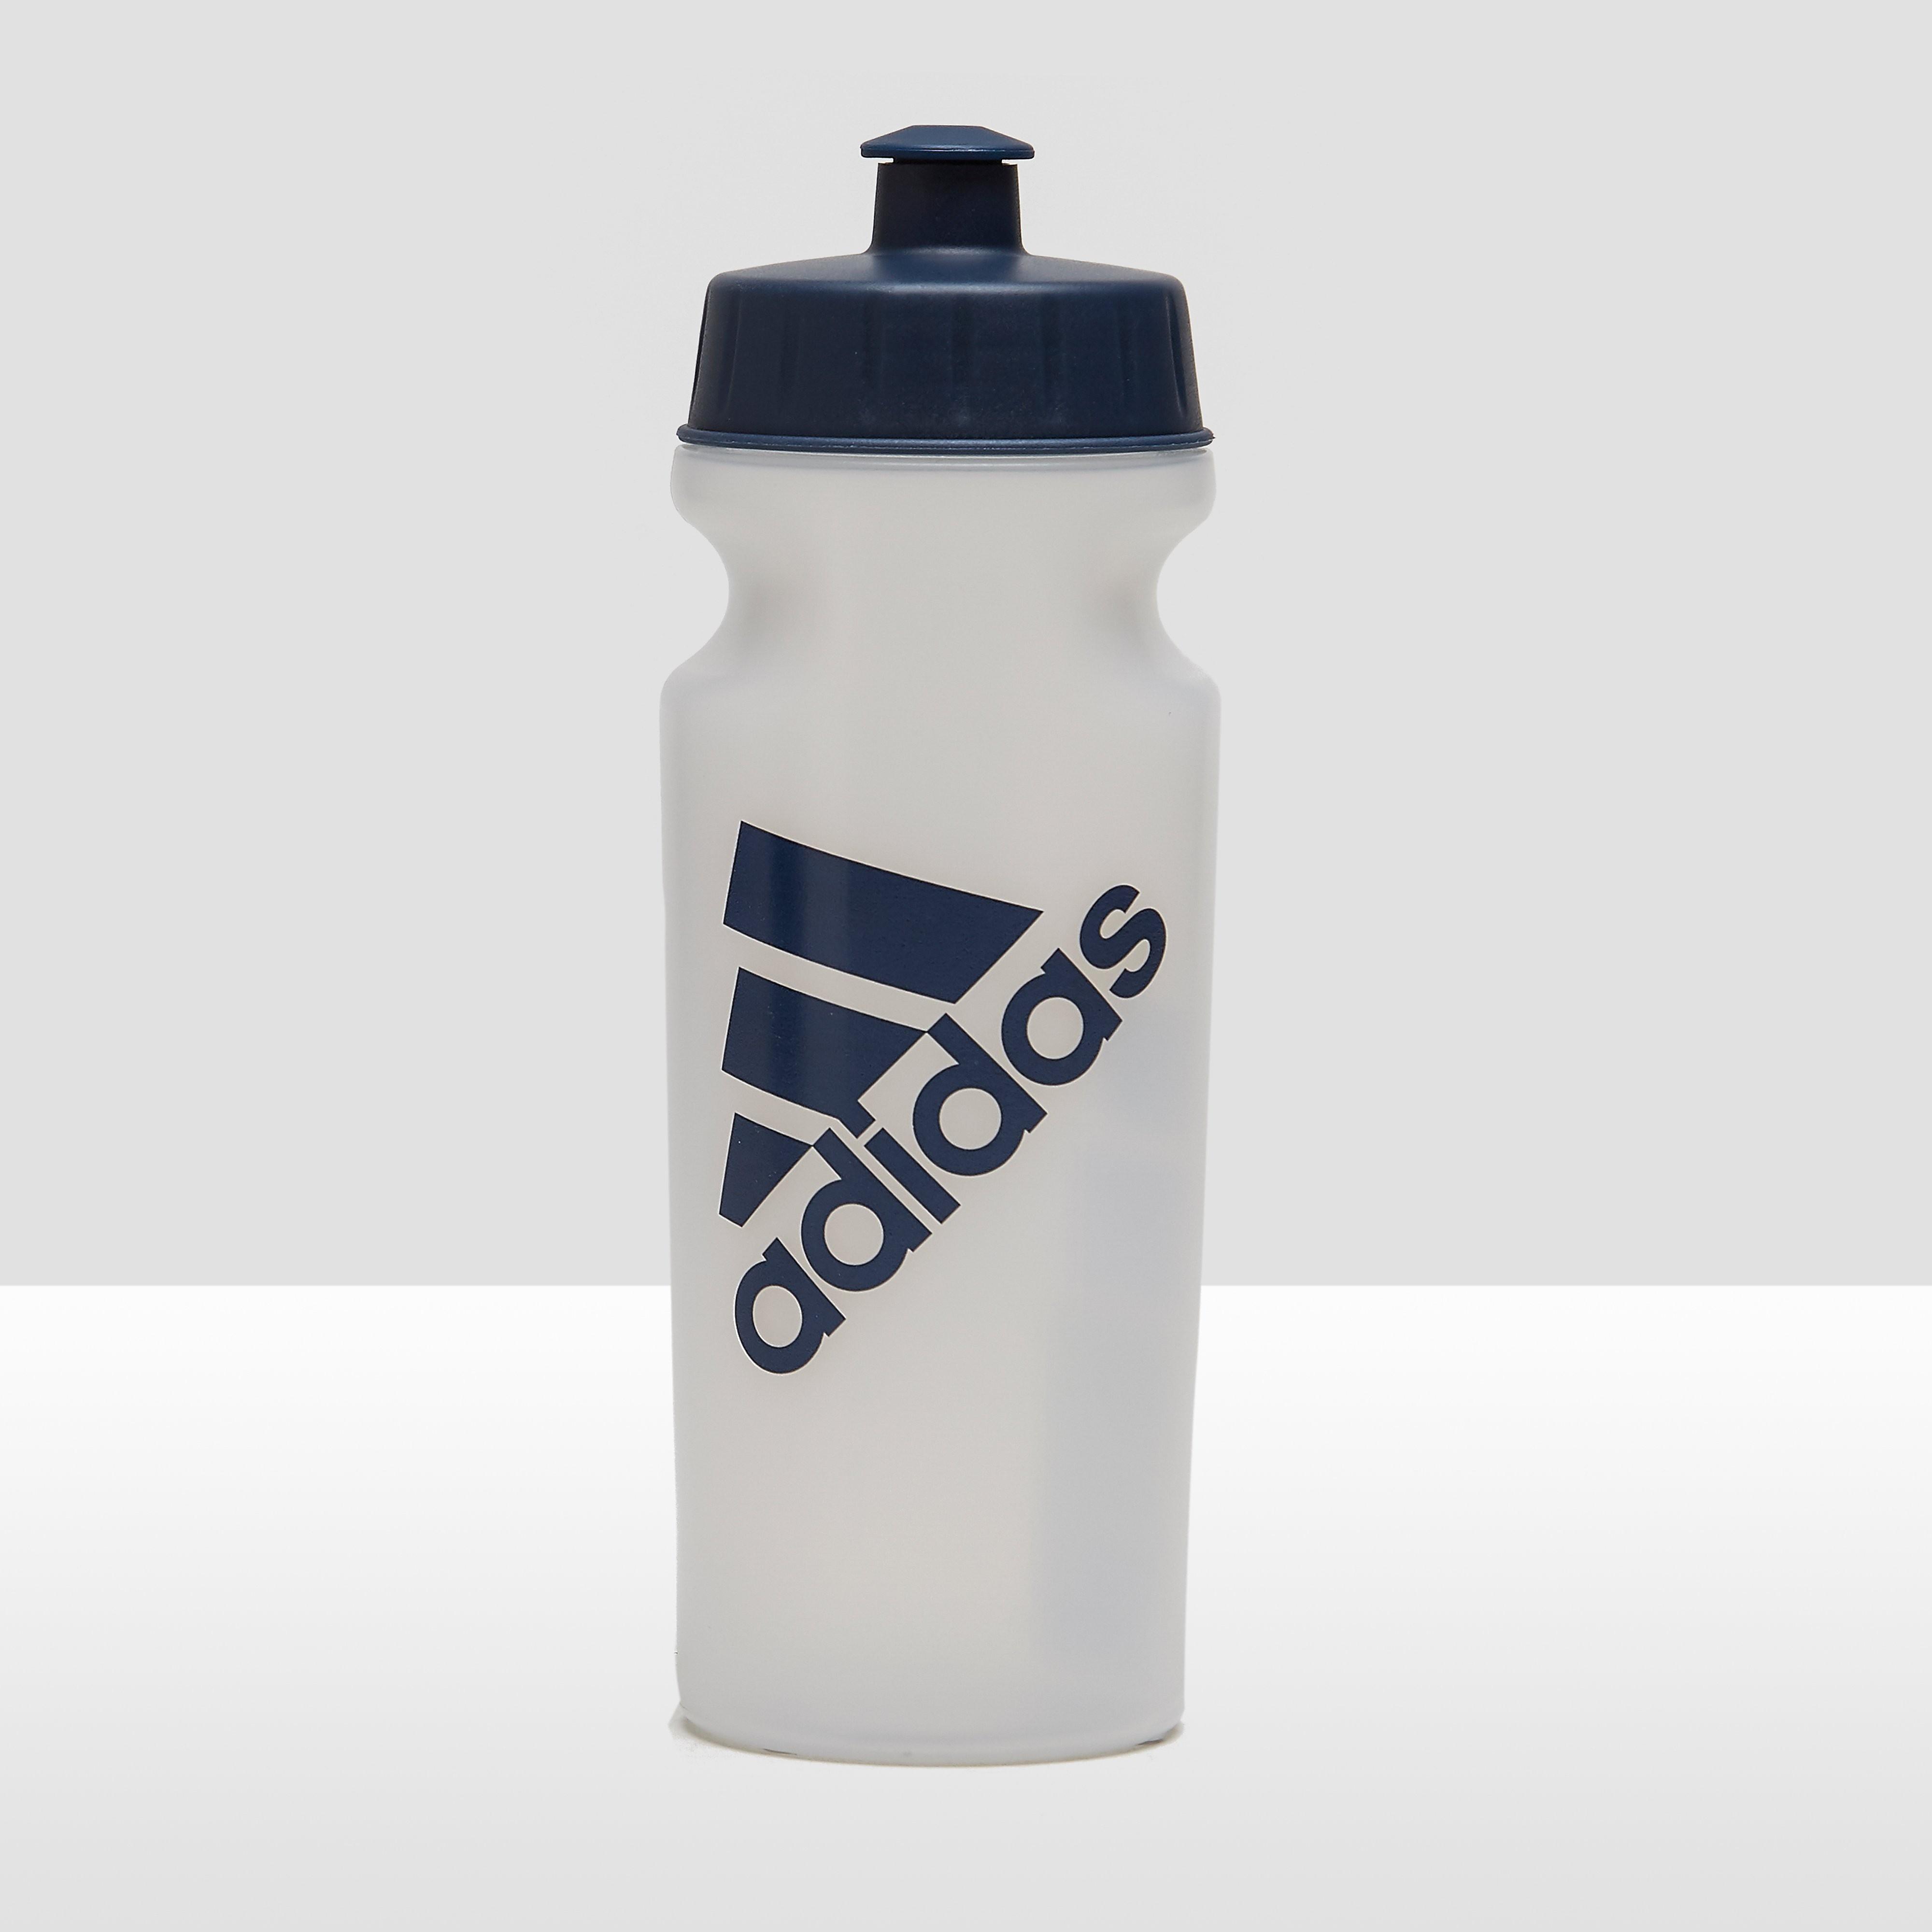 Performance Bidon 0,5 Liter